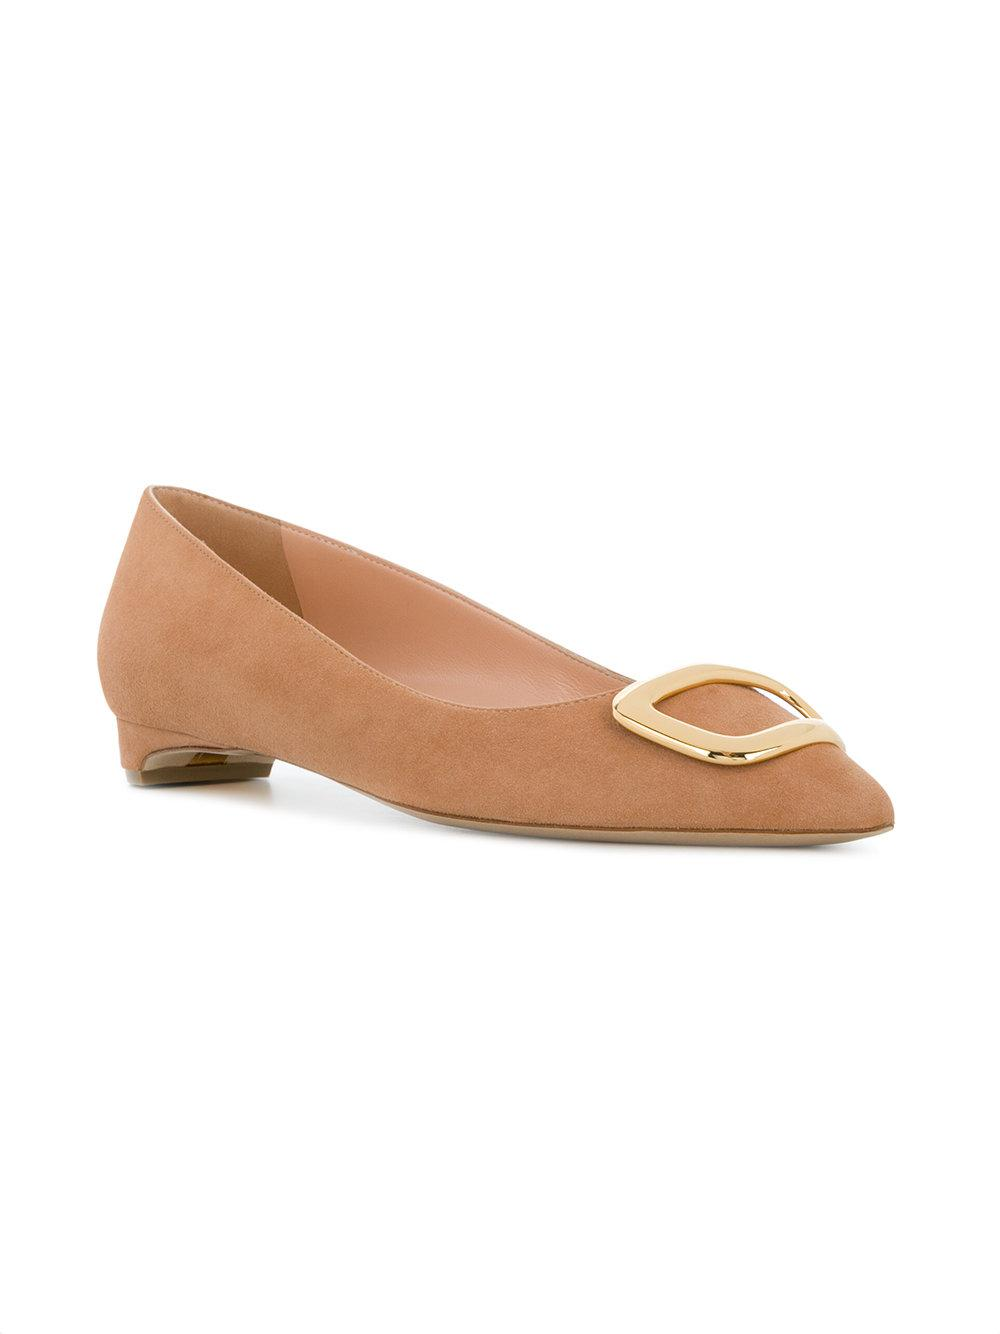 Rupert Sanderson Bedfa ballerina shoes OWFW3rE9E